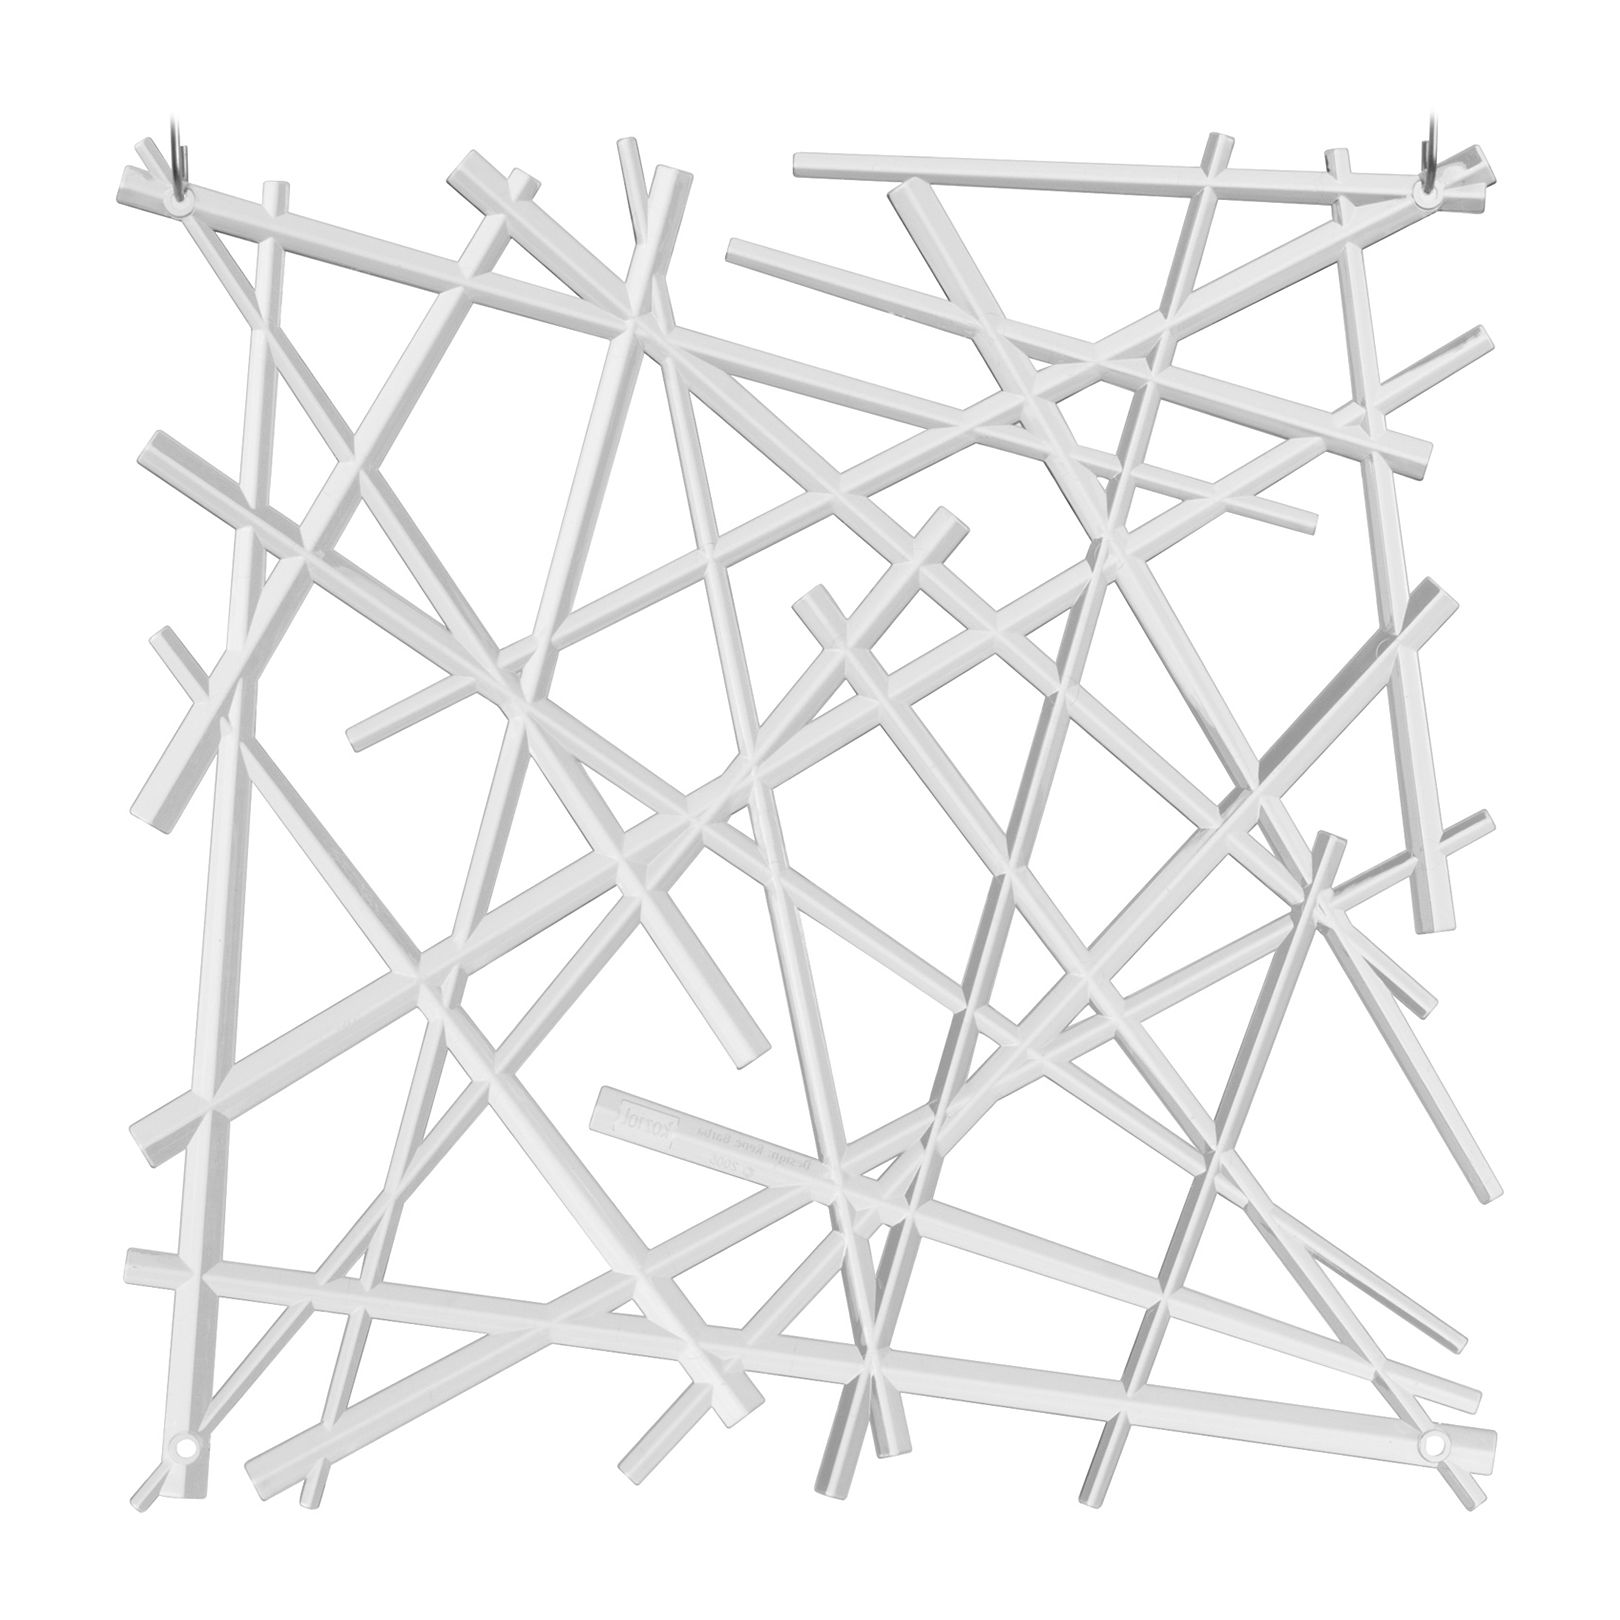 Raumteiler Stixx (4er-Set), Koziol